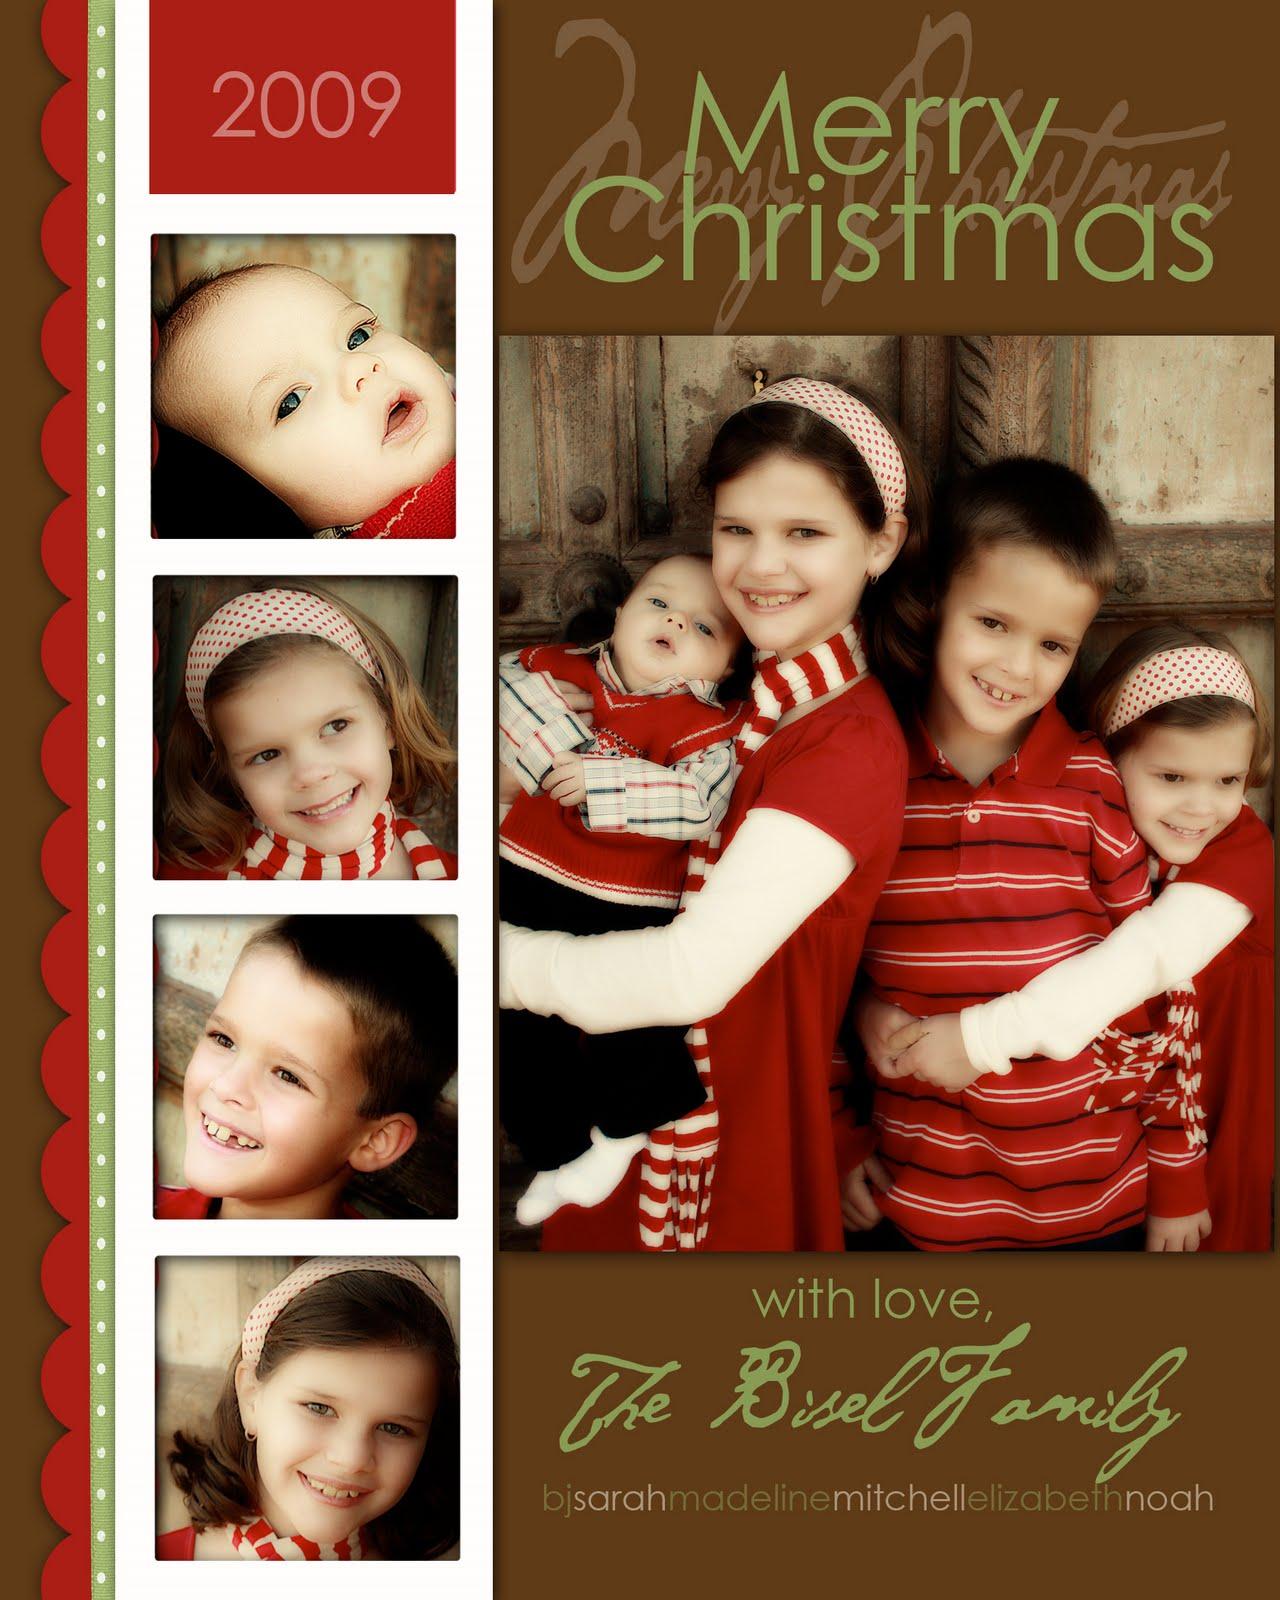 Milkandhoneydesigns: My Loss, Your Gain: Free Christmas